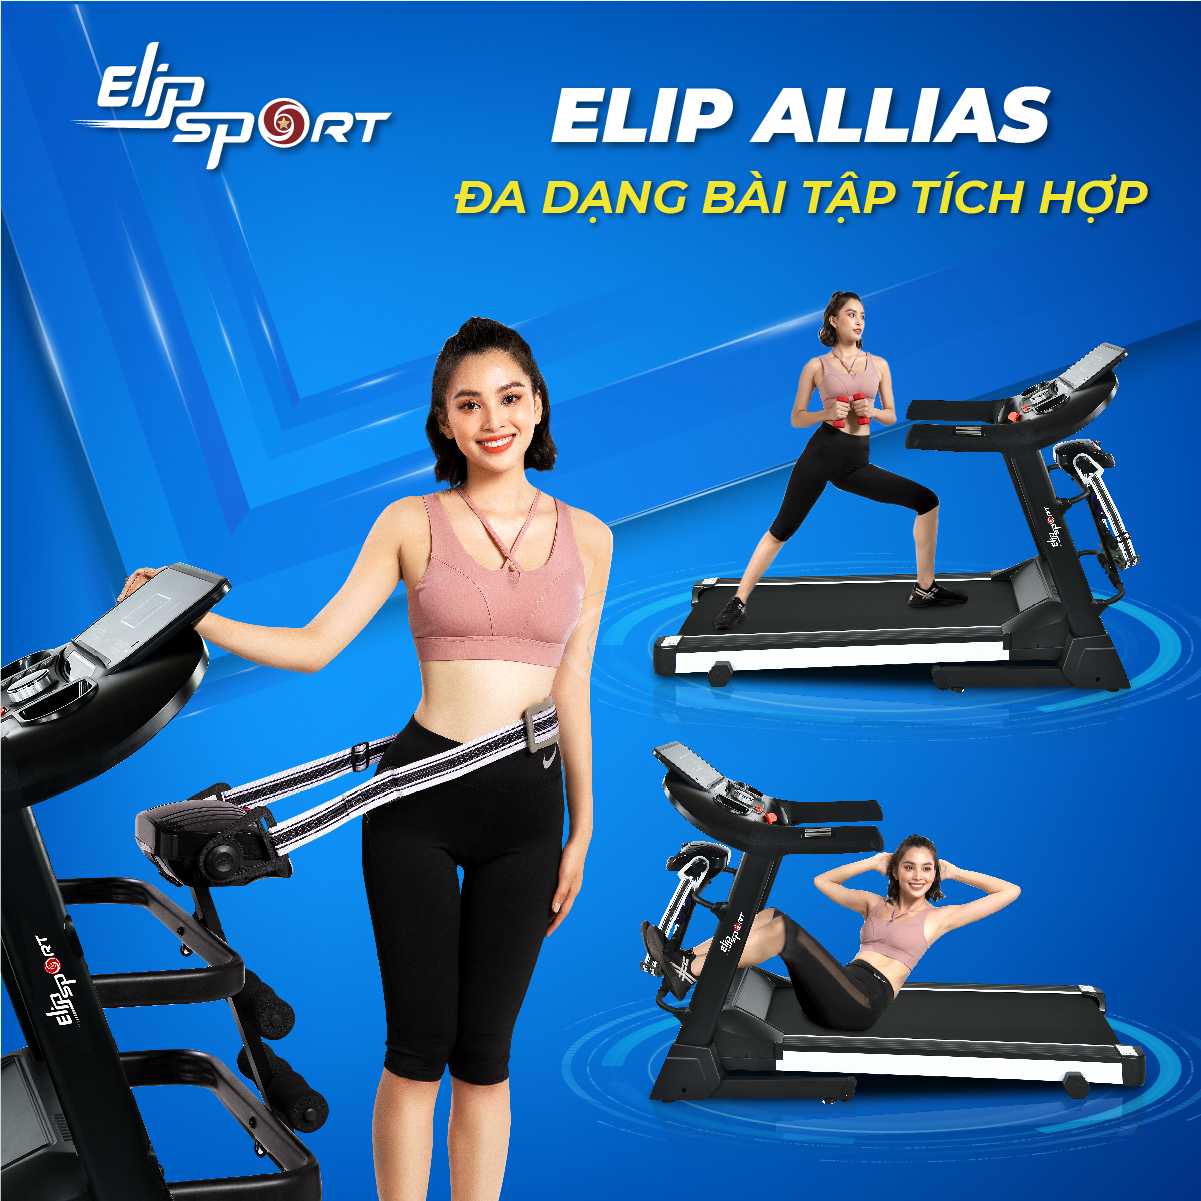 Máy chạy bộ ELIP Allias